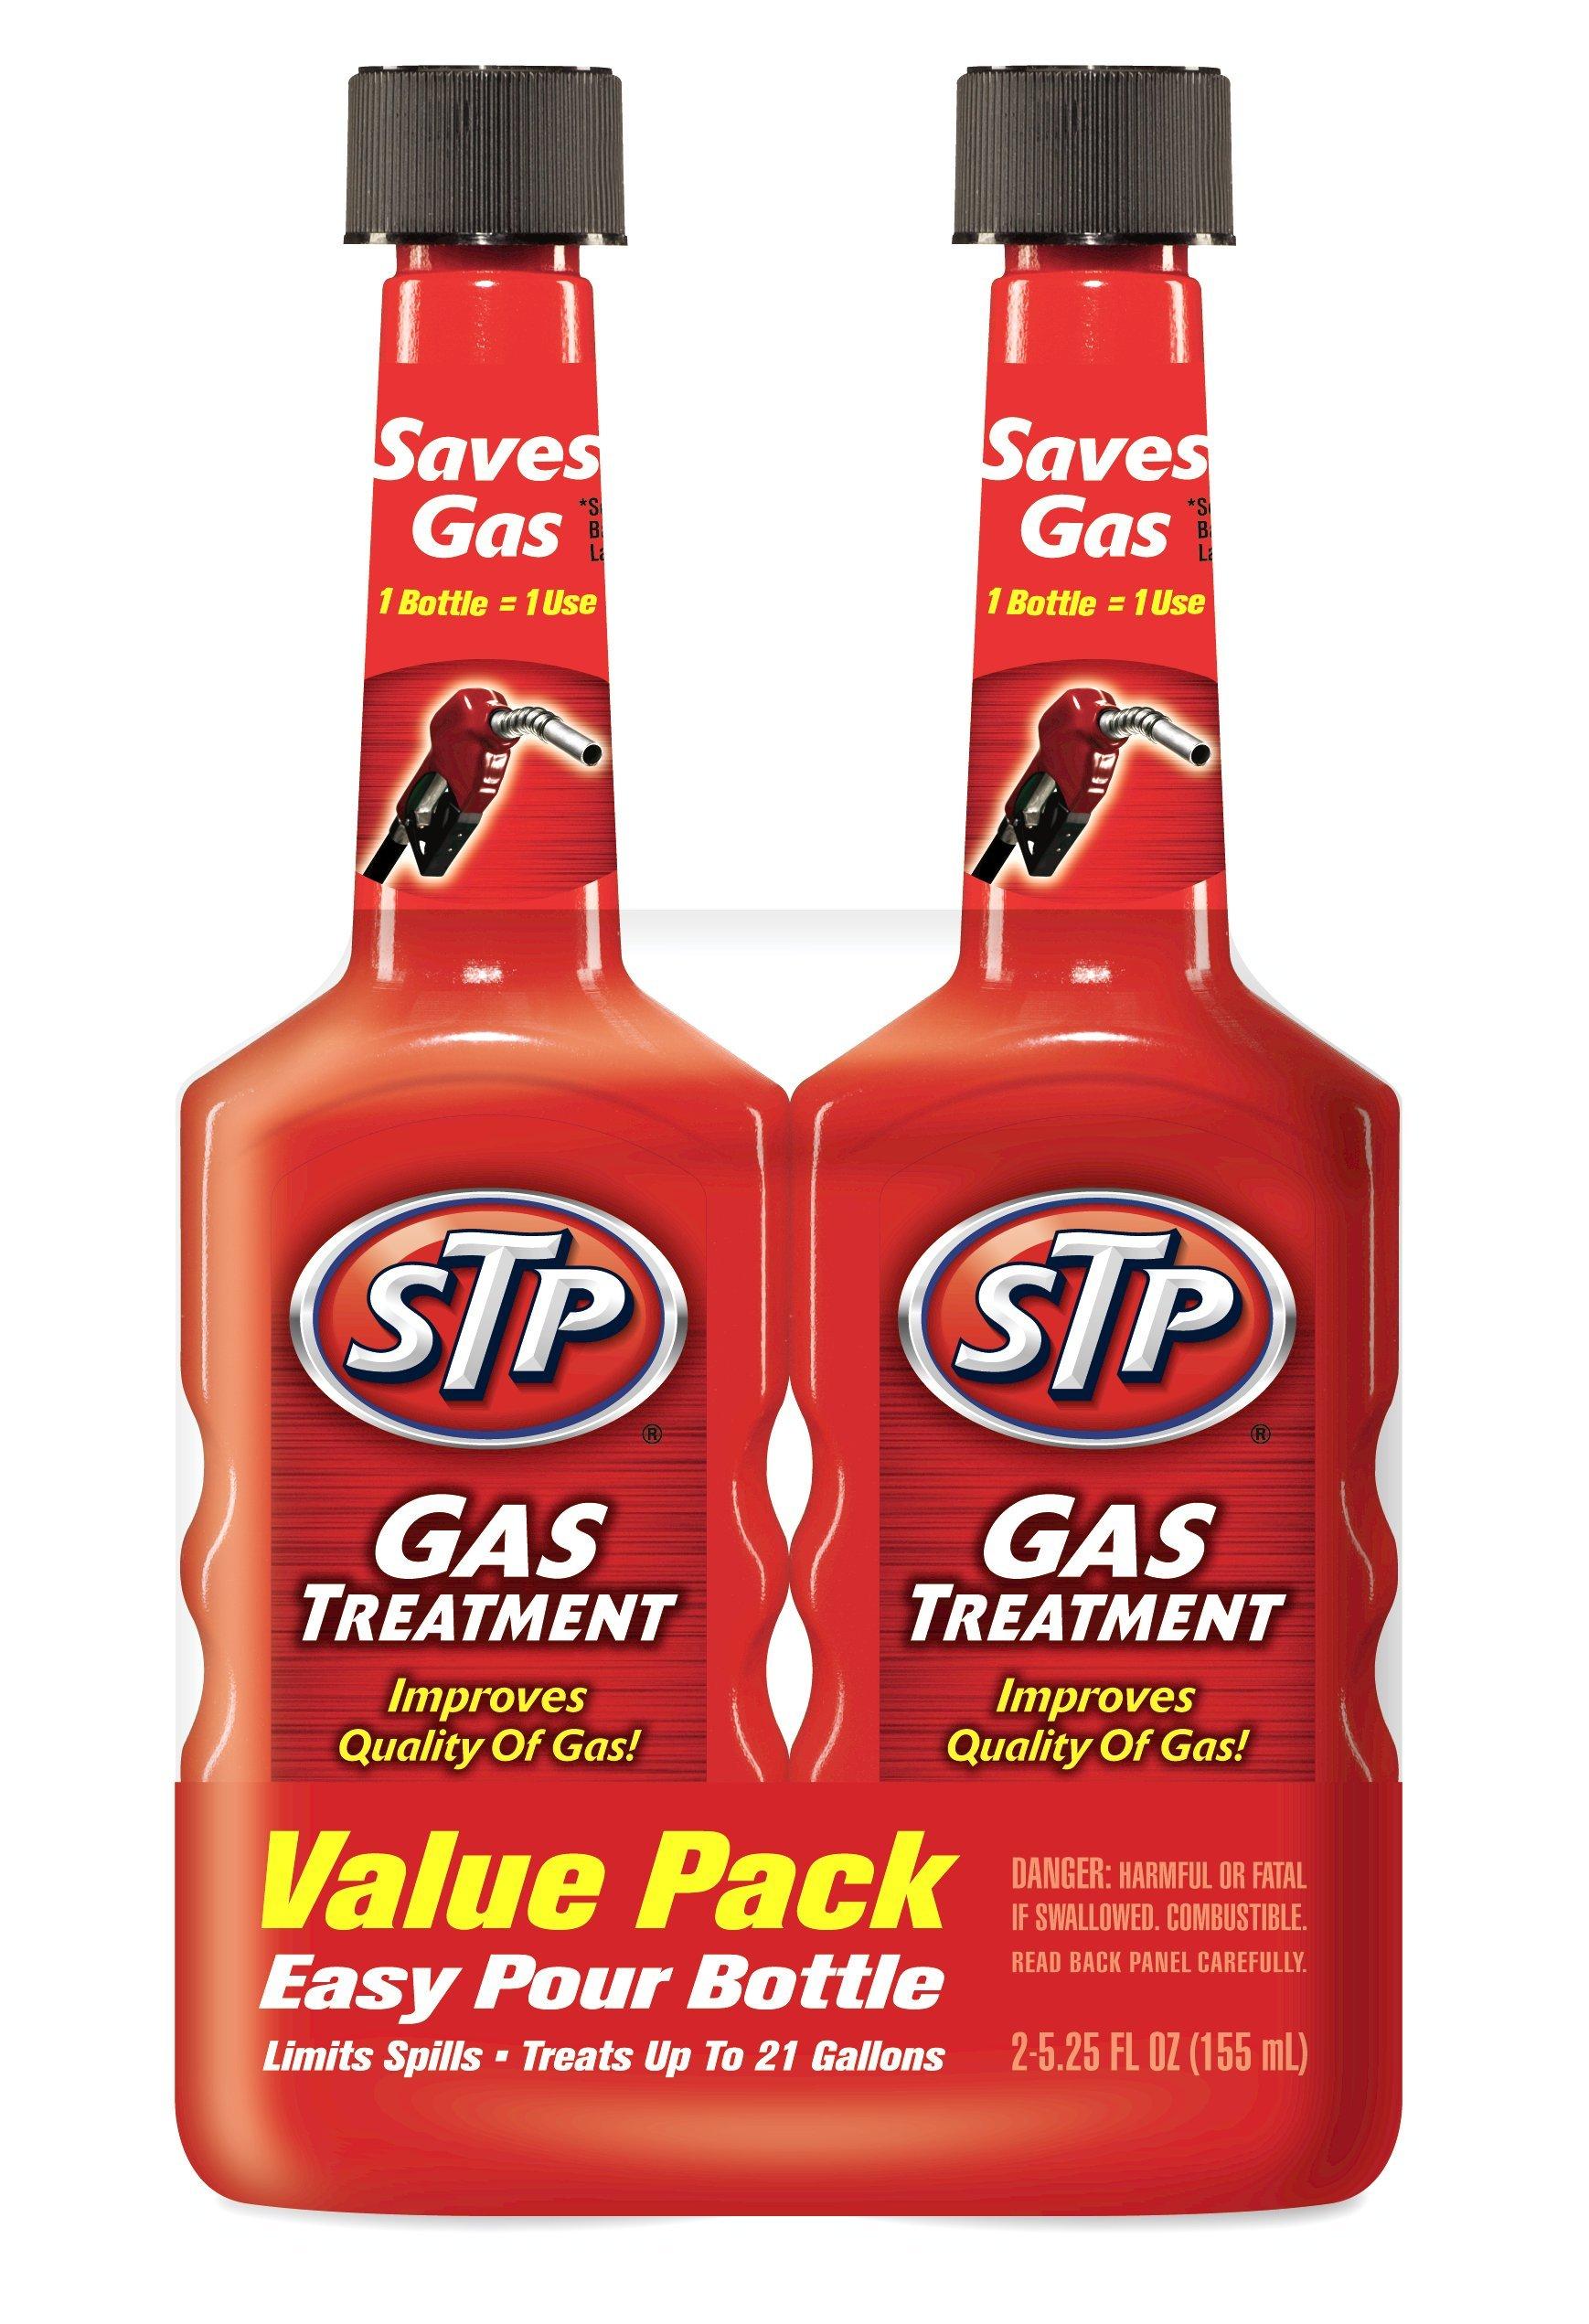 STP Gas Treatment (5.25 fluid ounces) (Case of 6), 78578-6PK